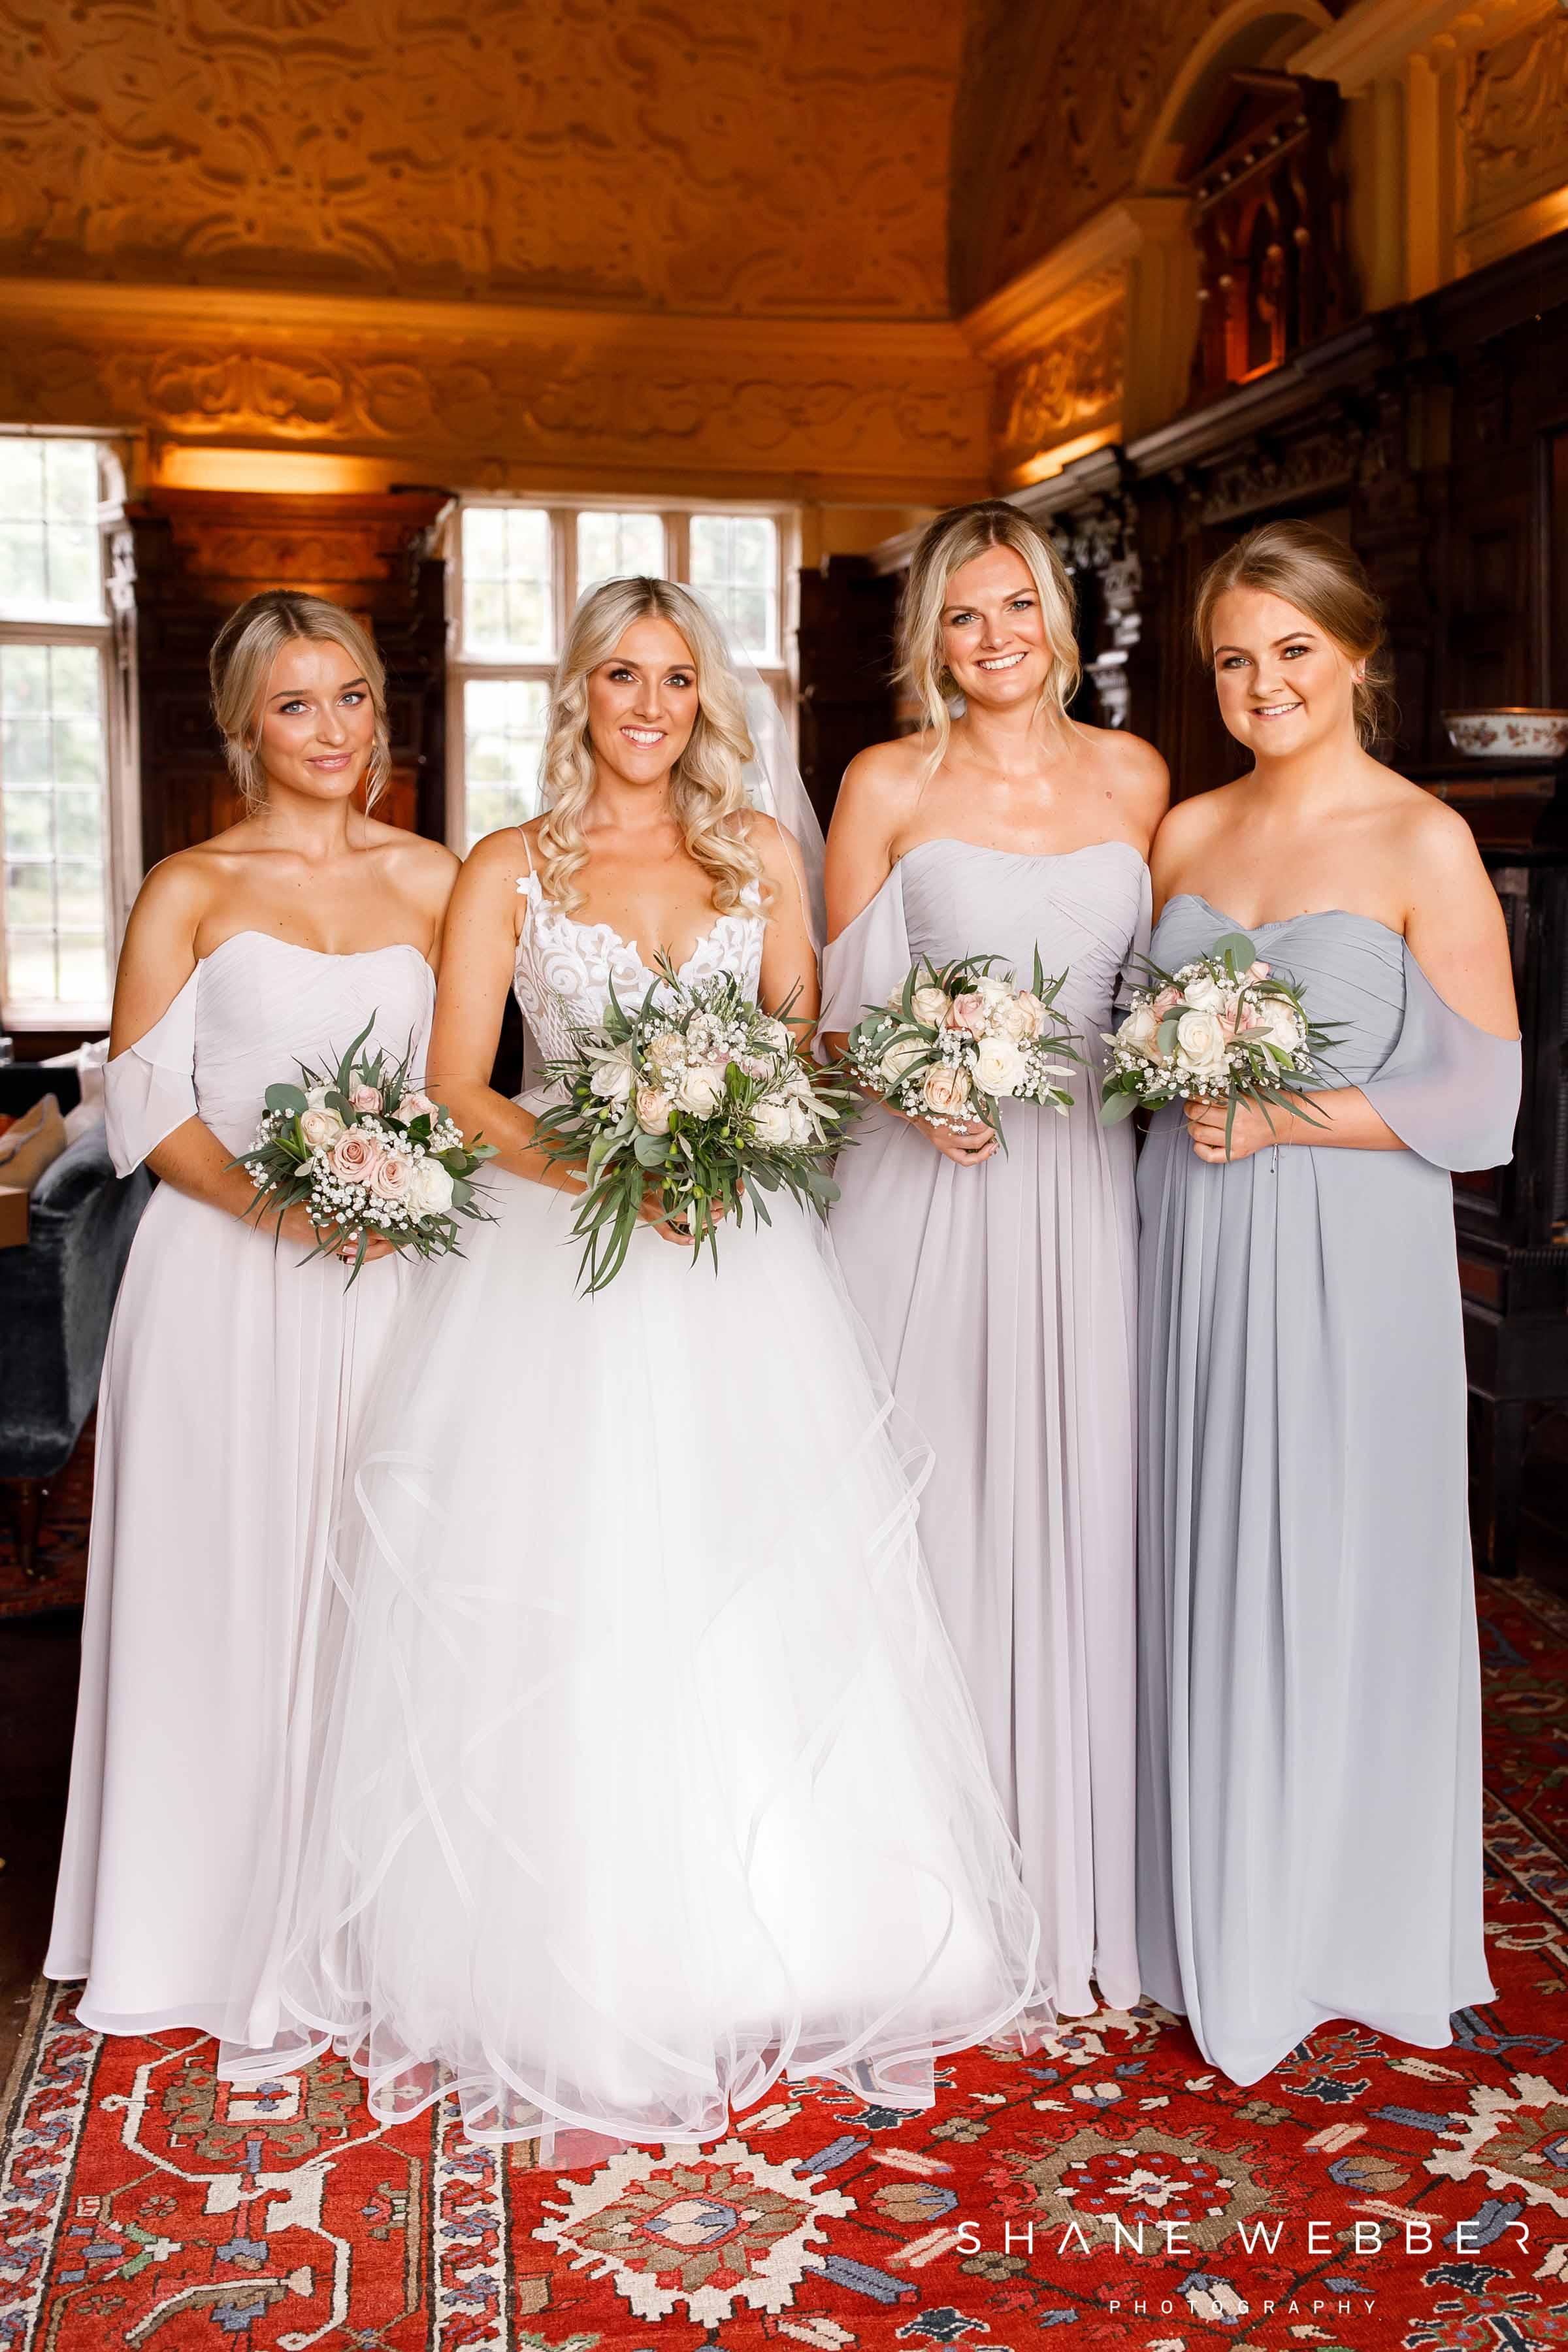 maria modes bridesmaids dresses